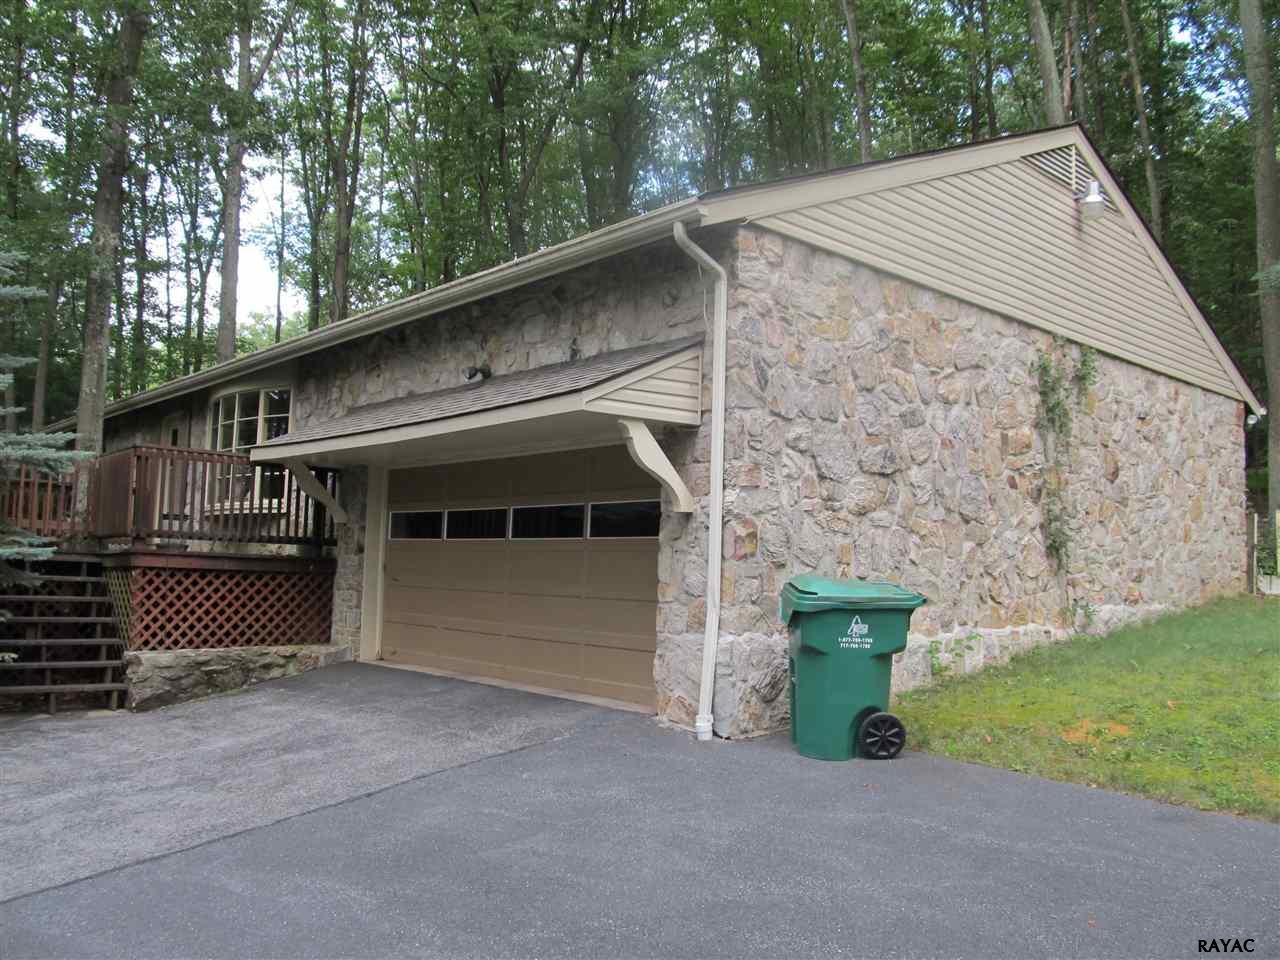 129 Mount Union Rd, Fayetteville, PA 17222